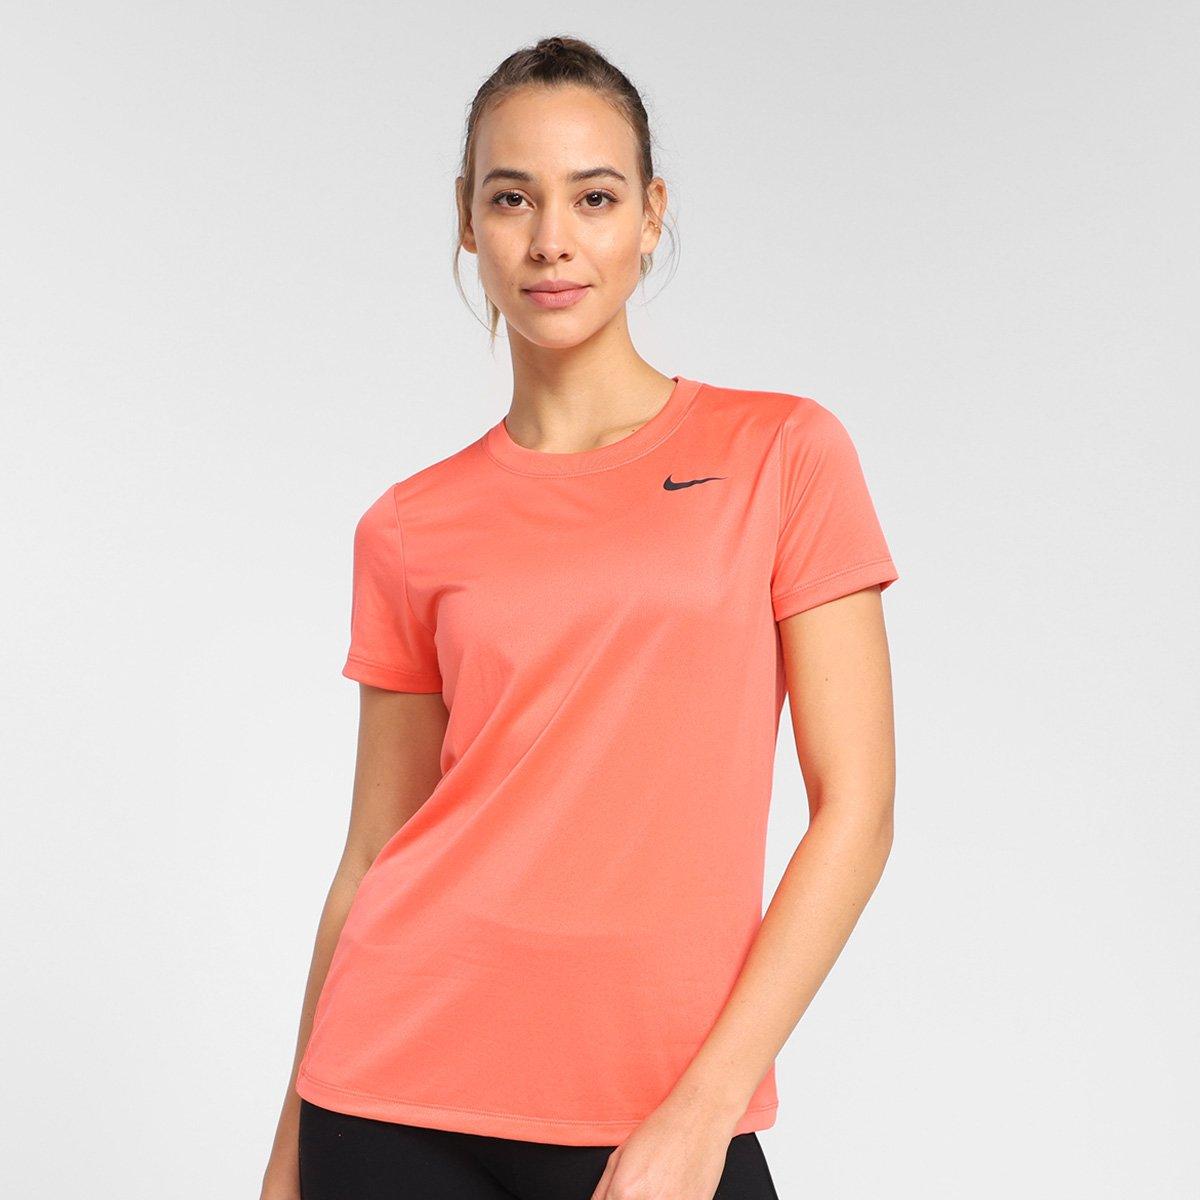 Blusa Nike Dry Legend Feminina